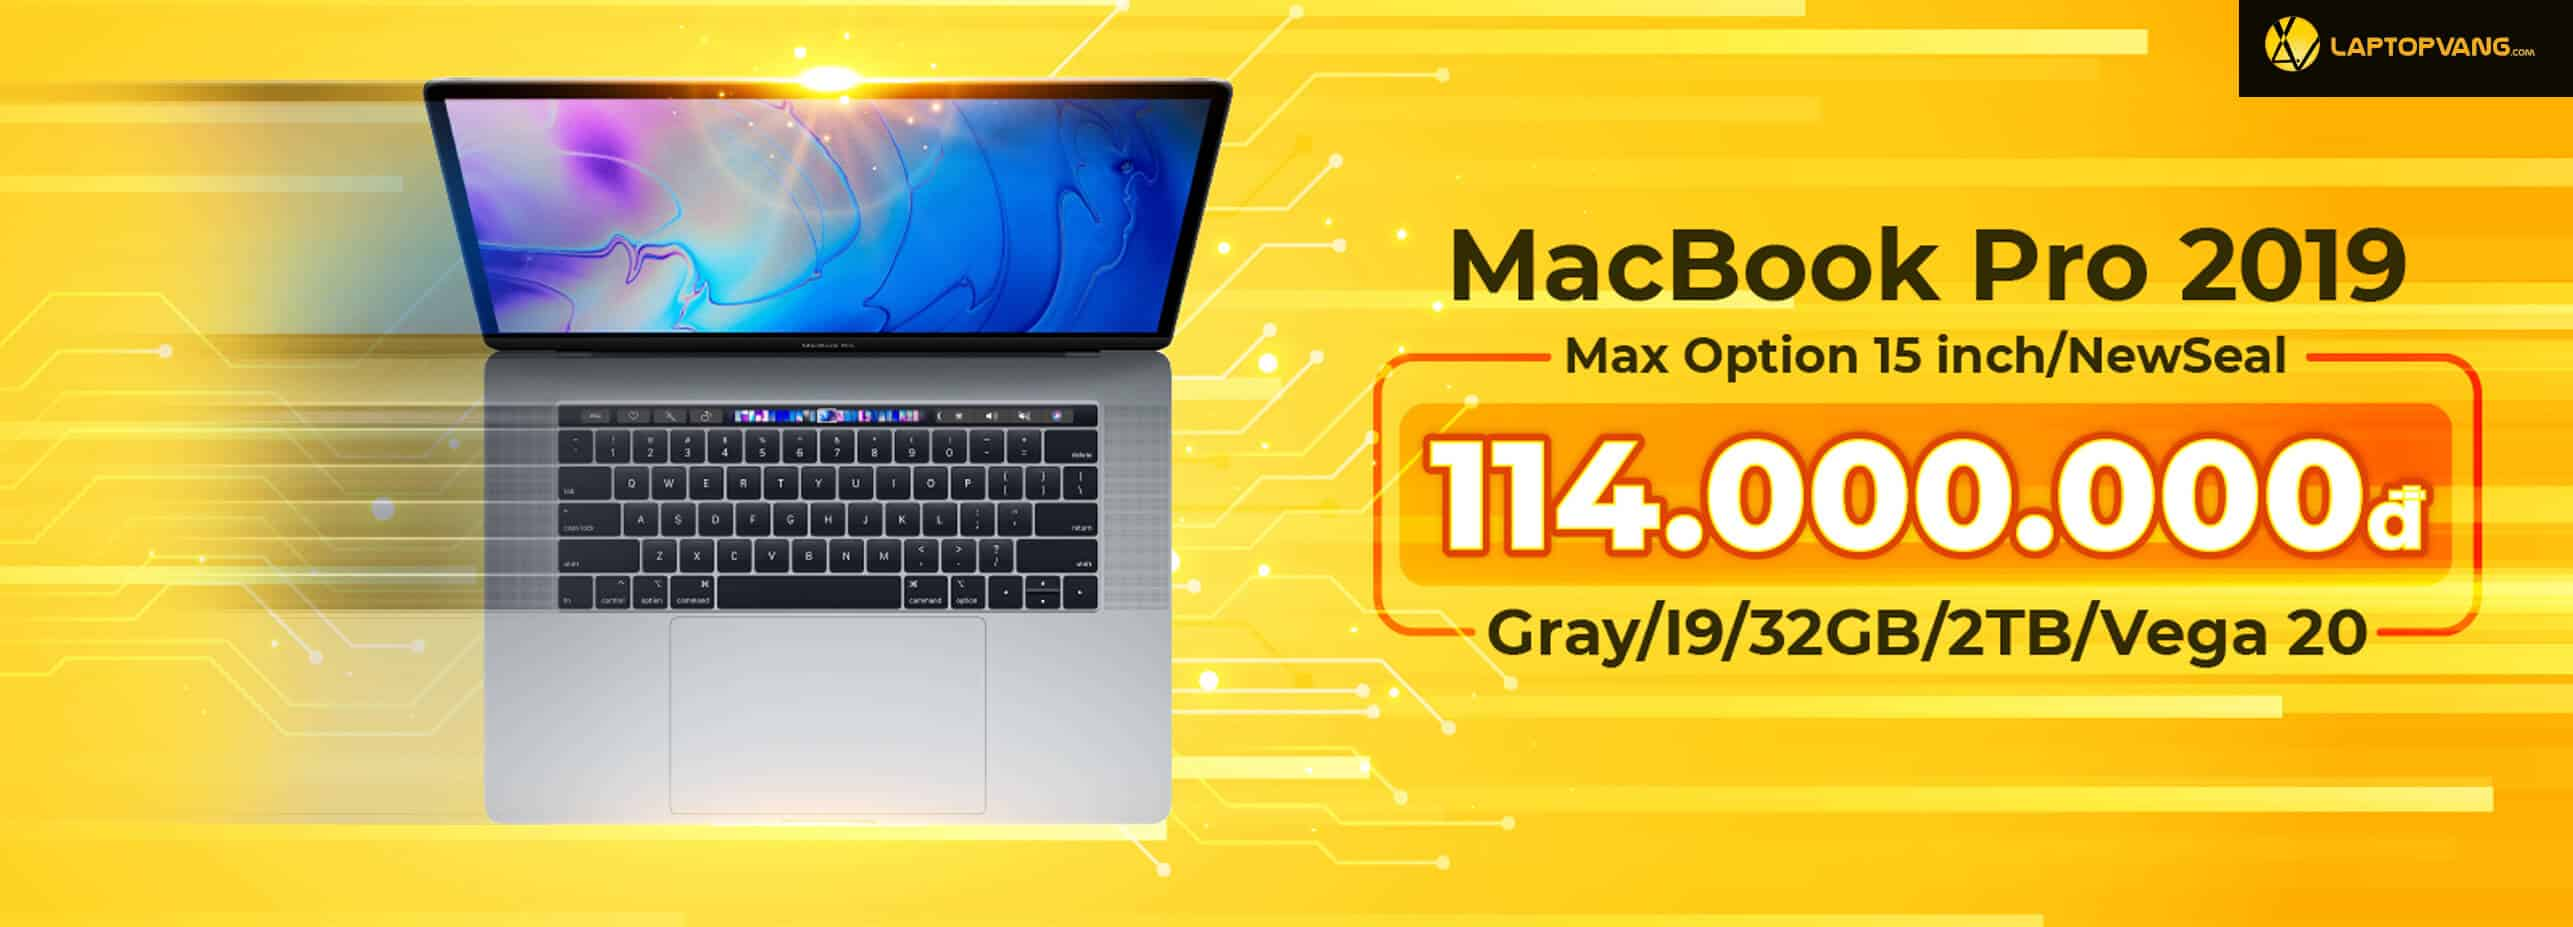 Laptopvang_macbook_pro_mv952_option